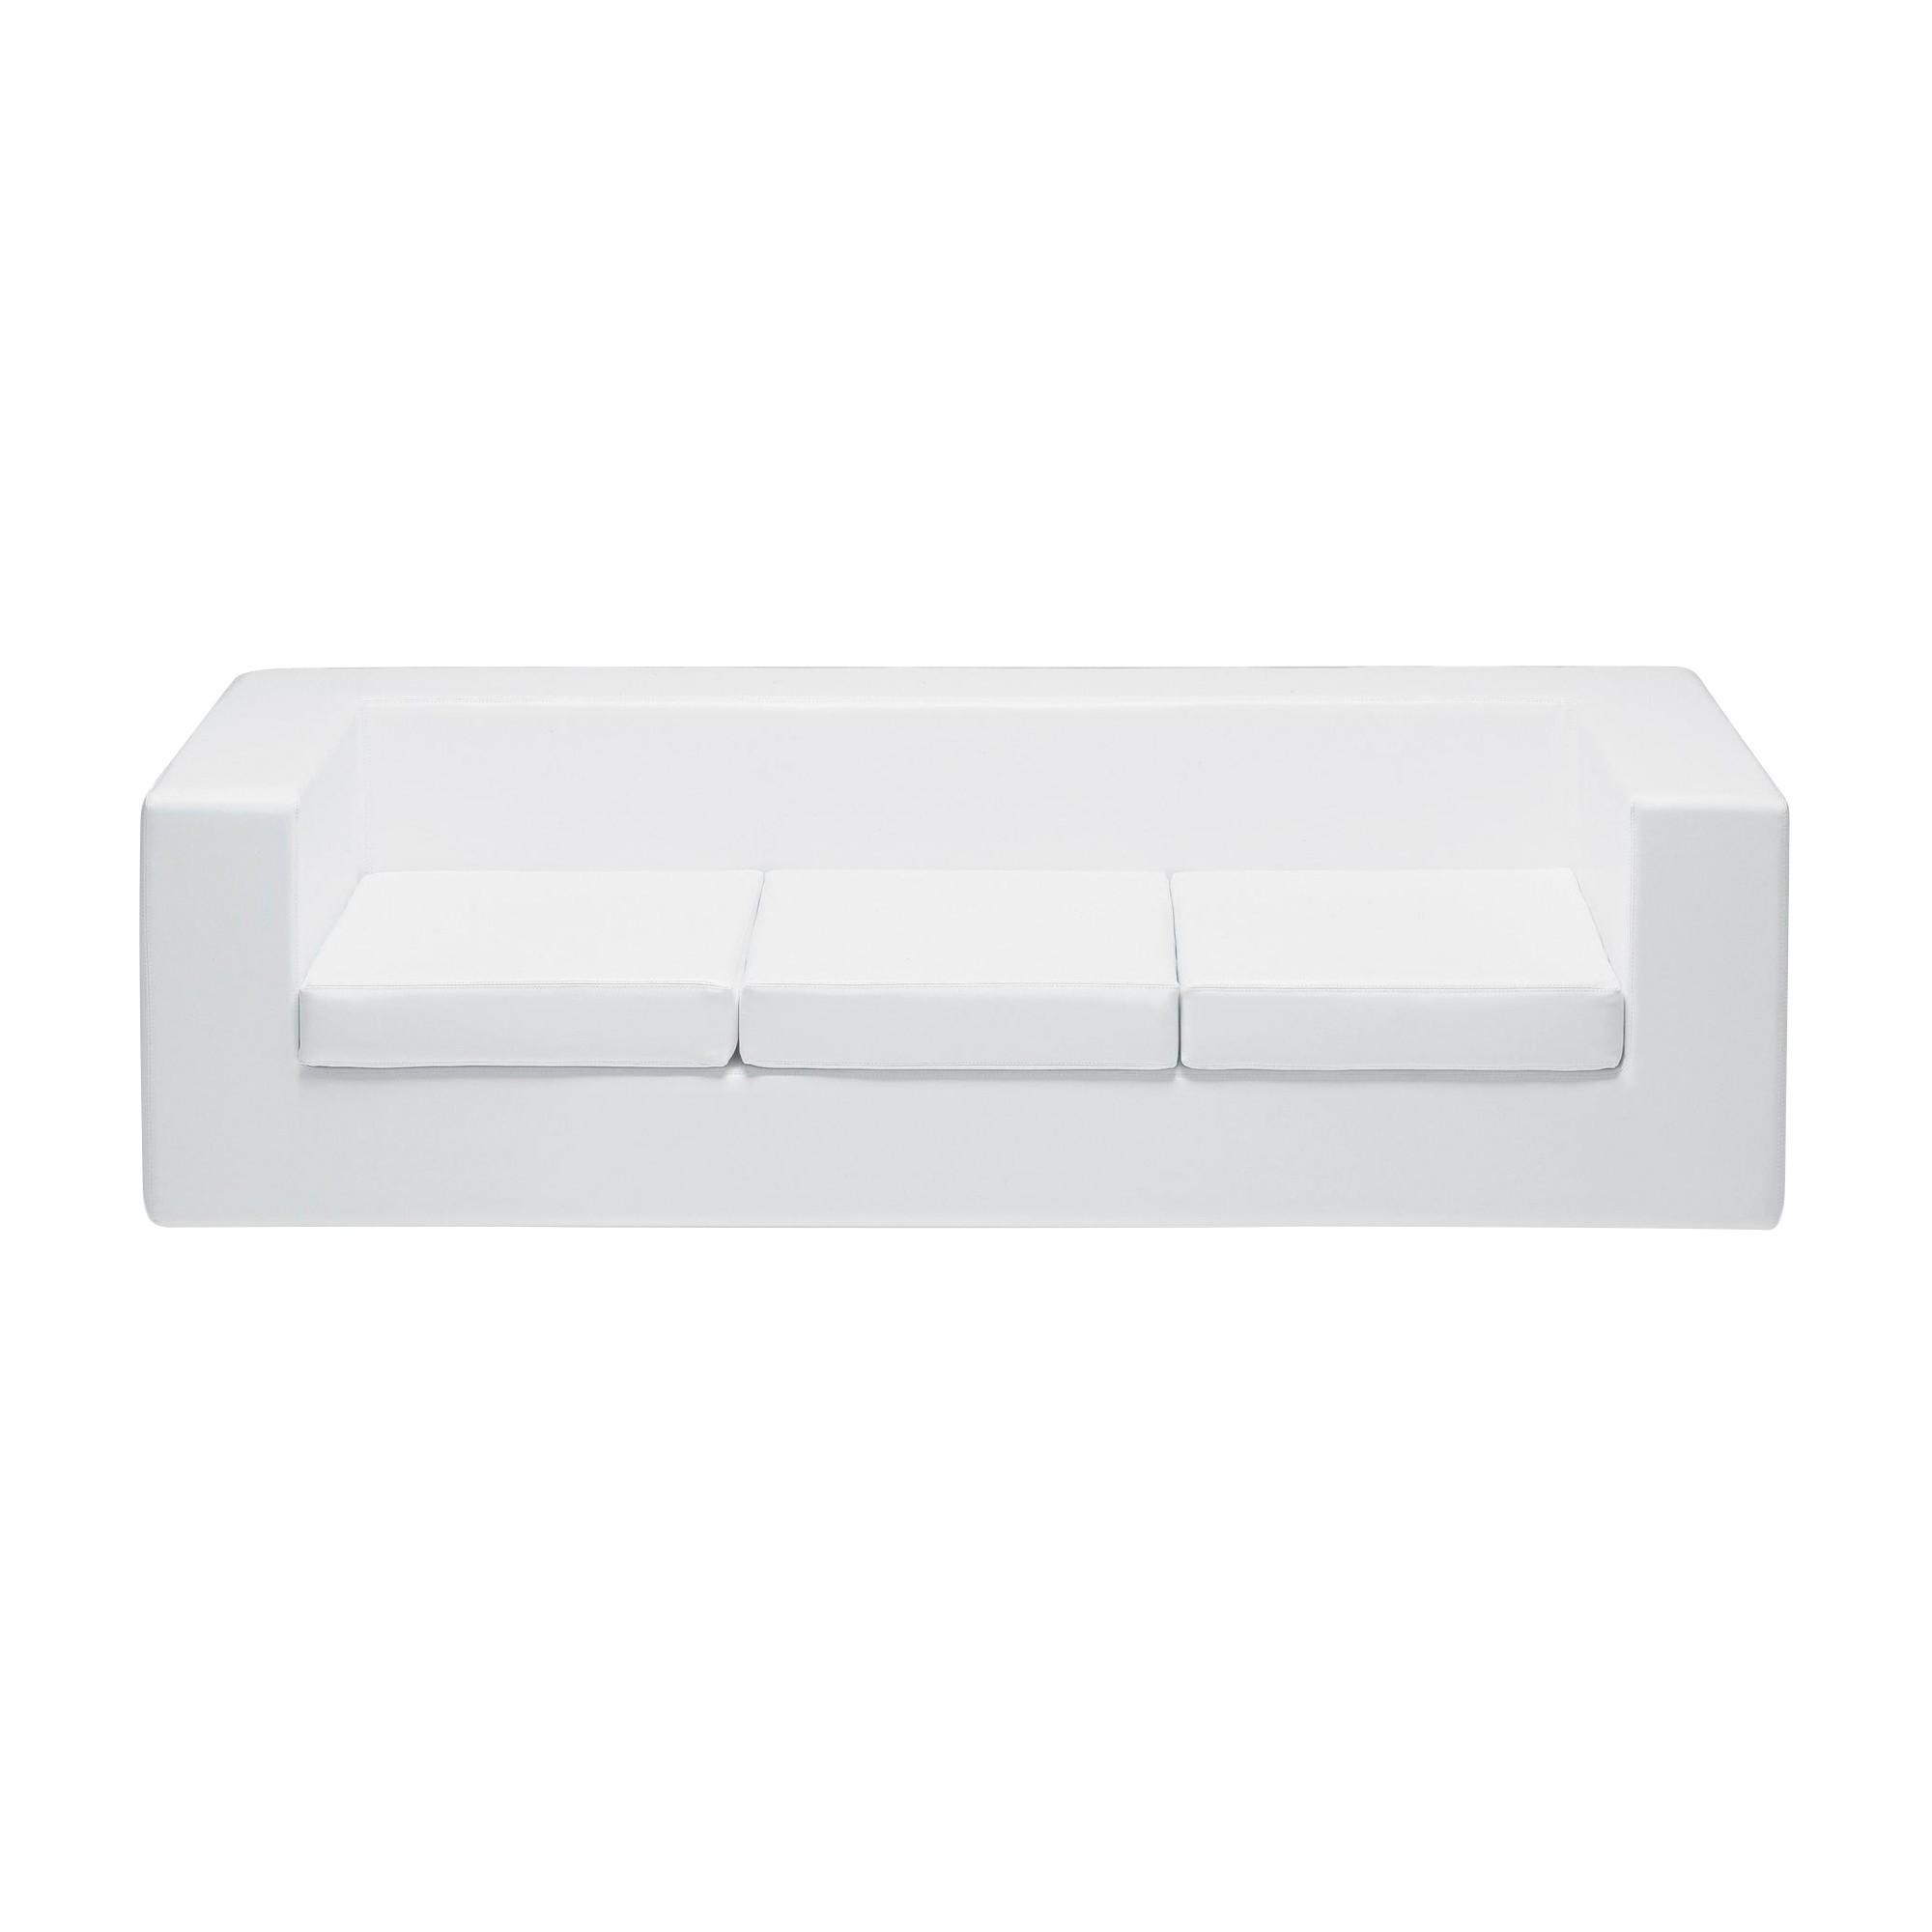 Admirable Throw Away 3 Seater Sofa Download Free Architecture Designs Rallybritishbridgeorg